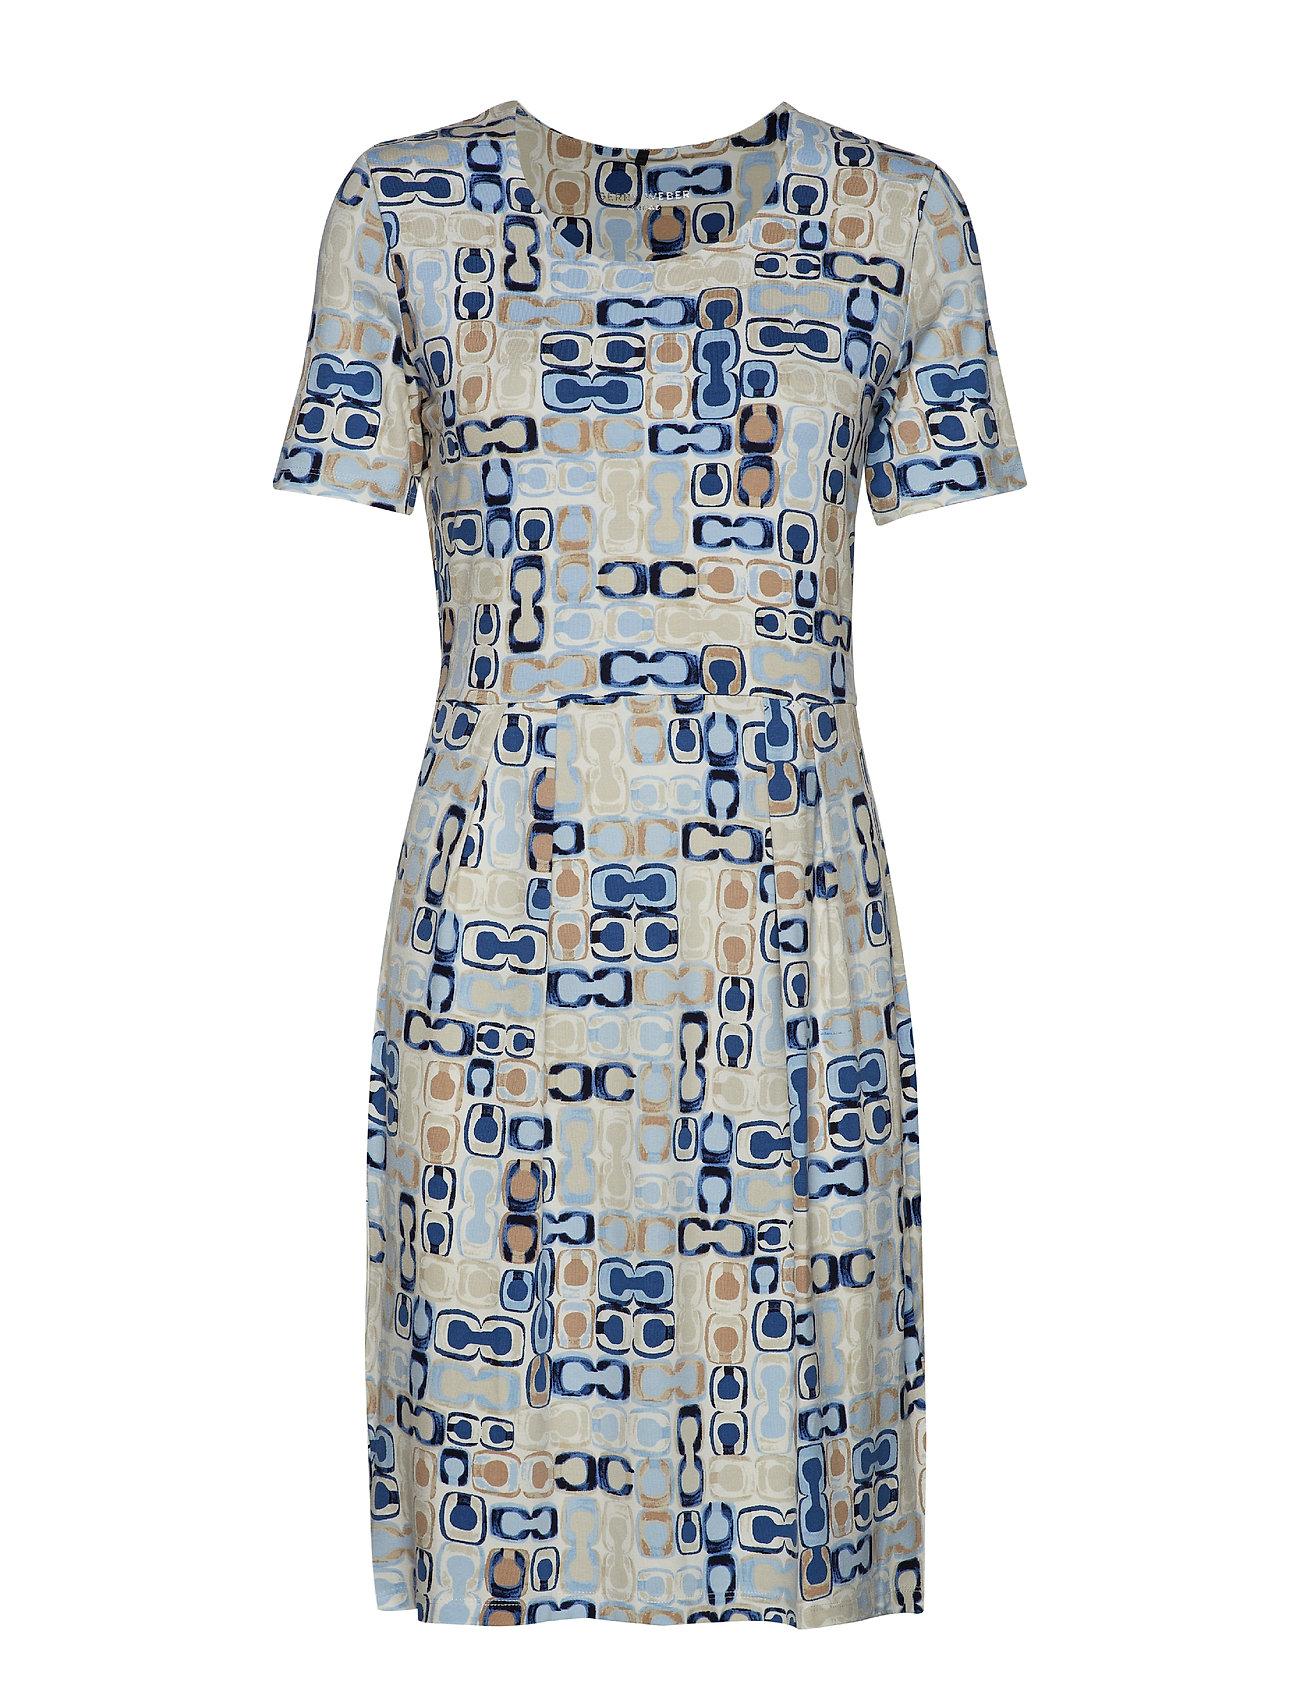 Gerry Weber Edition DRESS KNITTED FABRIC - BLUE PRINT